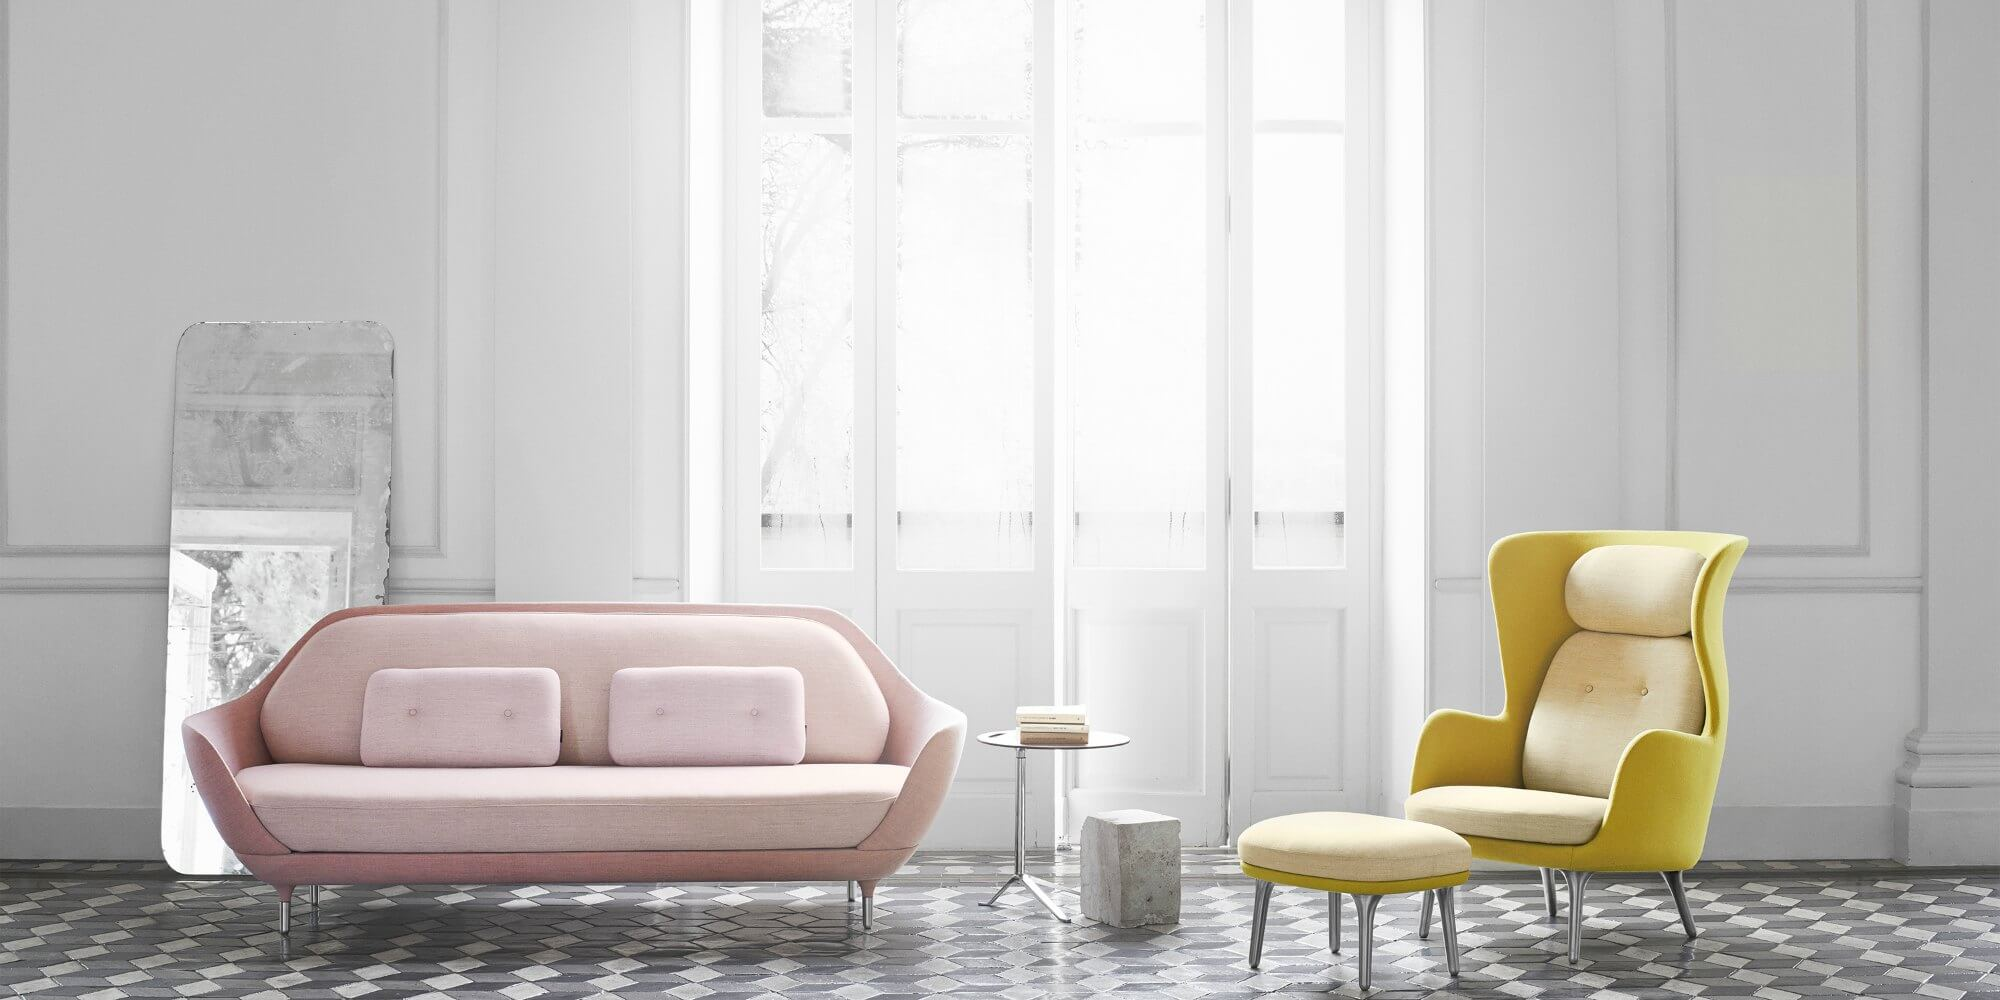 Butacas sillones y sofas fritz hansen adeyaka barcelona for Butacas y sillones